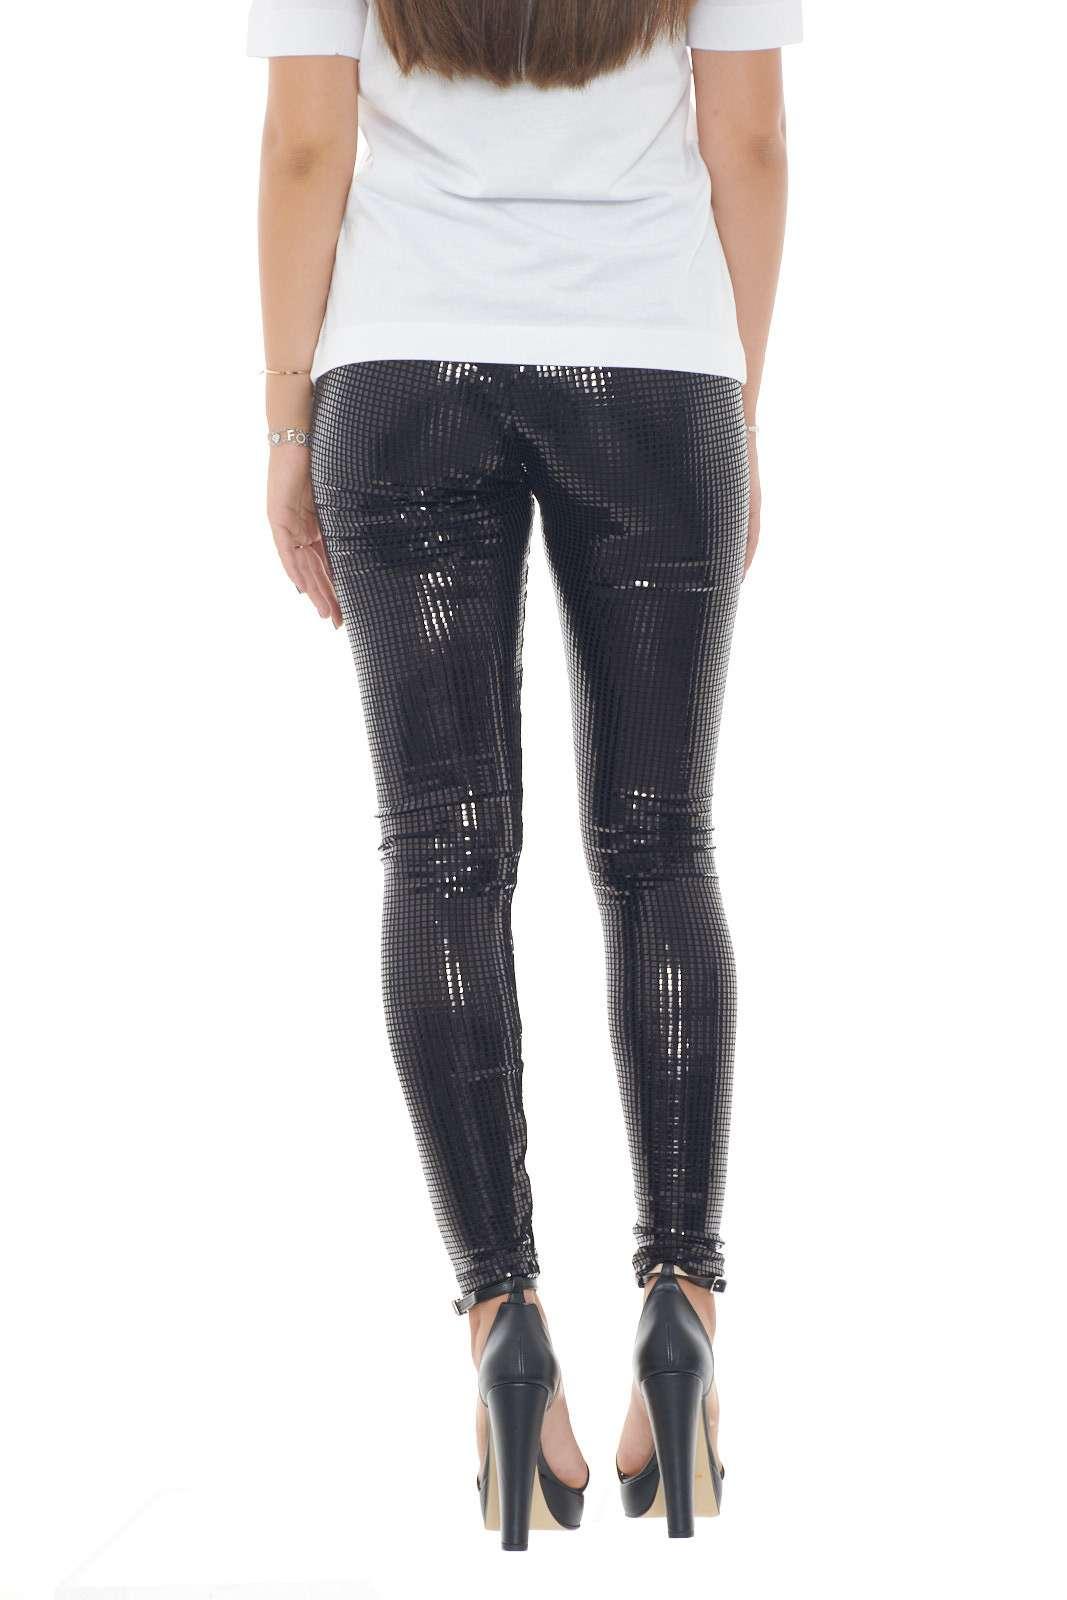 https://www.parmax.com/media/catalog/product/a/i/AI-outlet_parmax-pantaloni-donna-Moschino-W%201%20516%2082%20E%202196-B.jpg